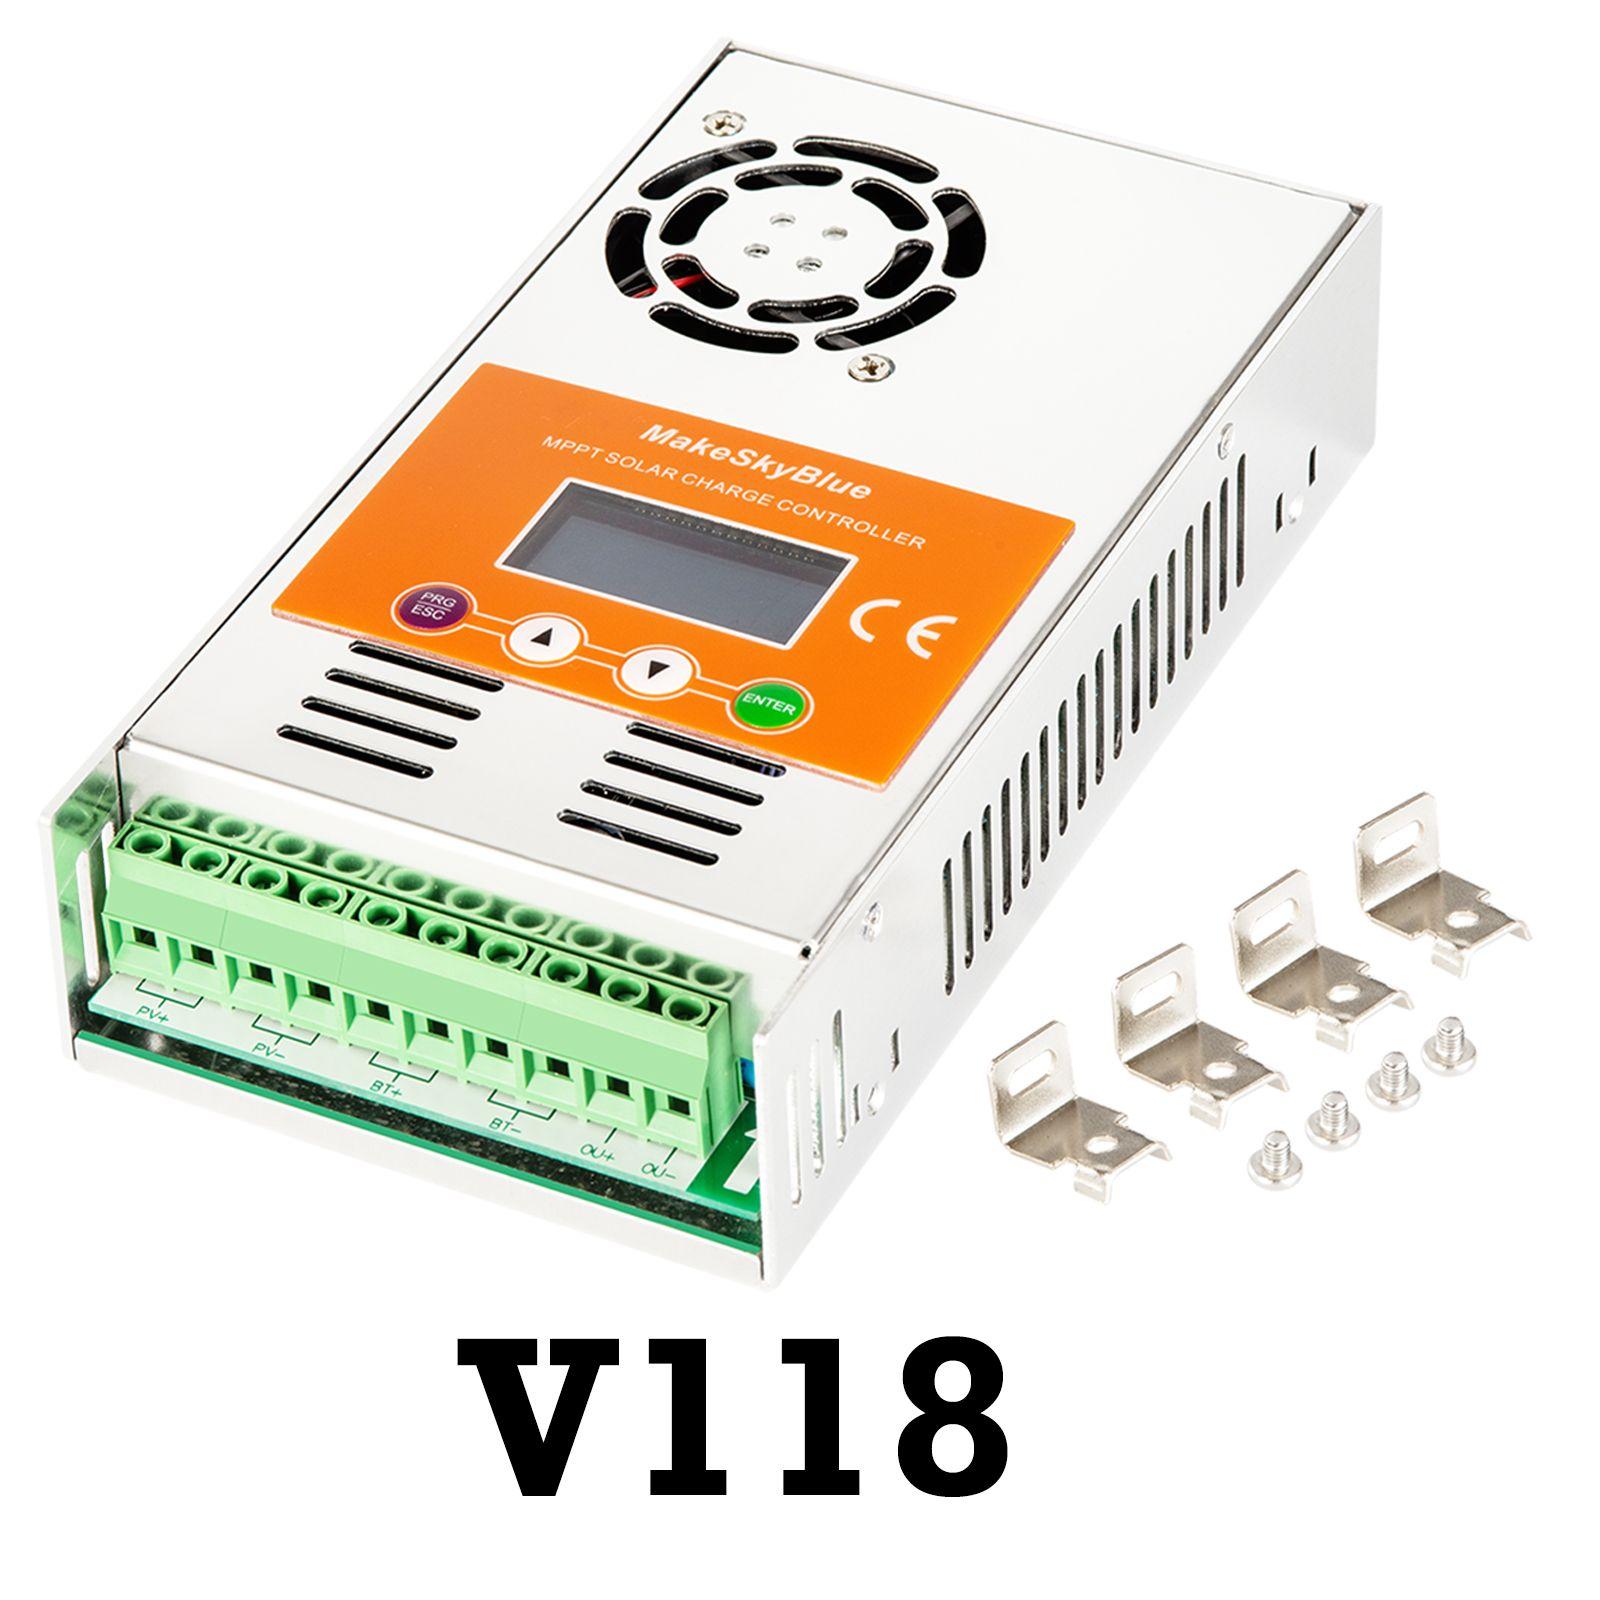 MakeSkyBlue MPPT Solar Laderegler 60A-V118 Power Regler für 12 V 24 V 36 V 48 V Blei Säure Gel liFePO4 Lithium-Batterie LCD